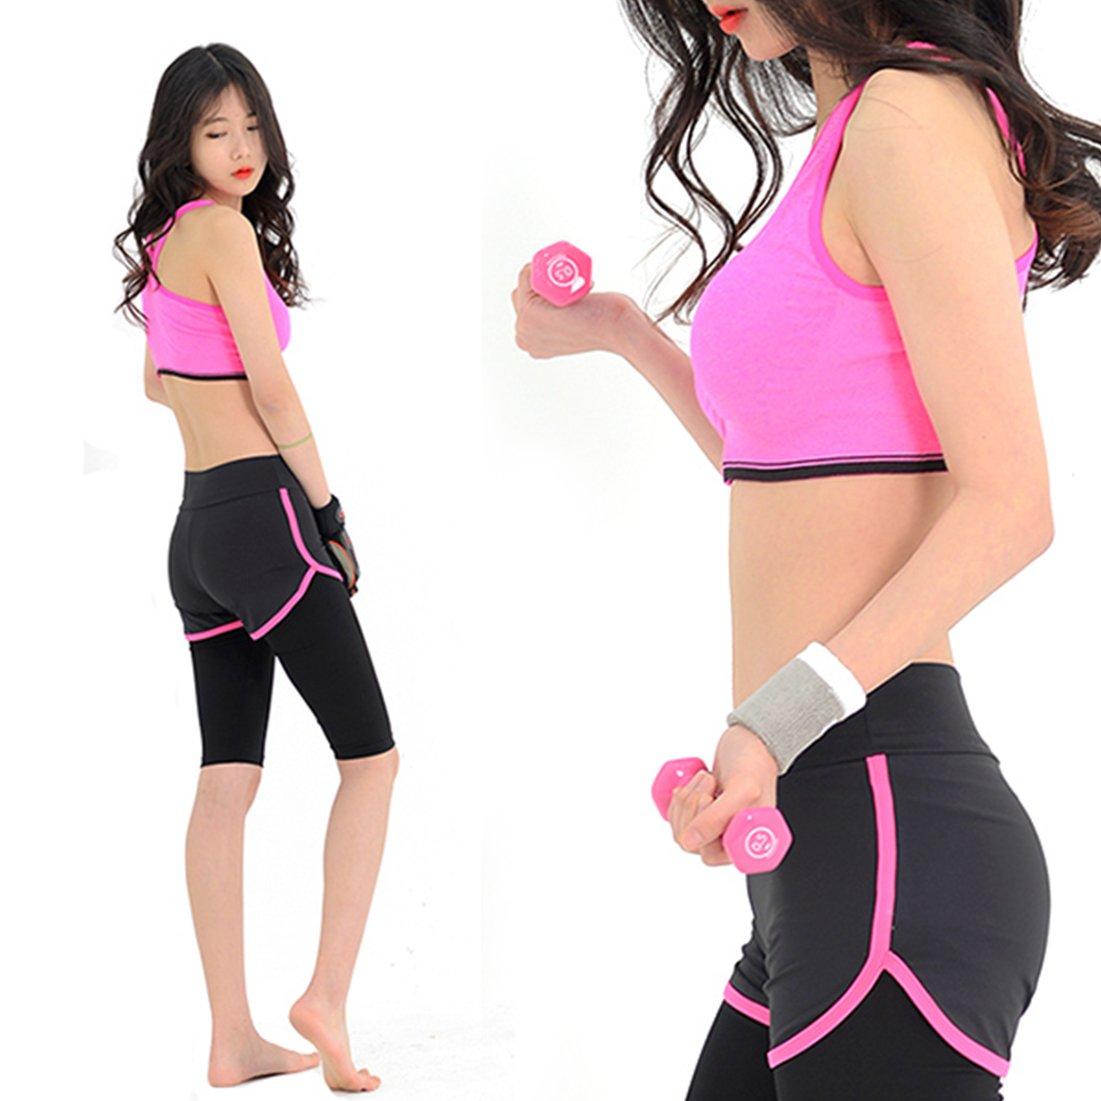 HARRA Sports Yoga Suit, Women's 2 Piece Activewear Set, Running Suit Gym Outfit Workout Wear, Fitness Training Set (L)